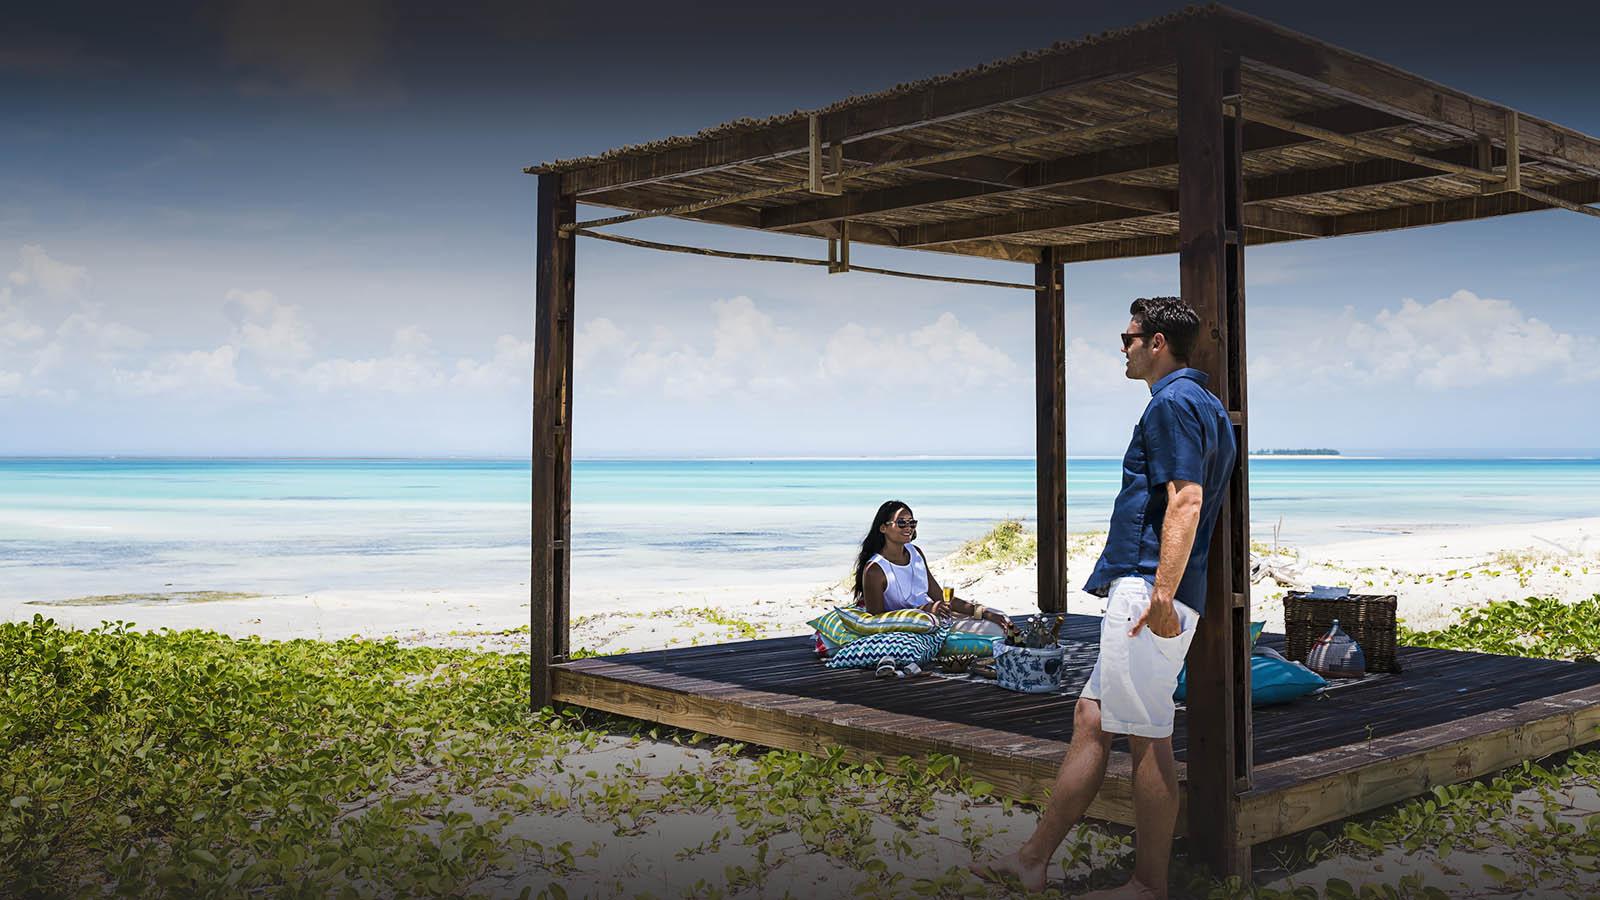 anantara medjumbe mozambique-lodges-zambia-in-style-pemba-quirimbas-island-resort-luxury-picnic